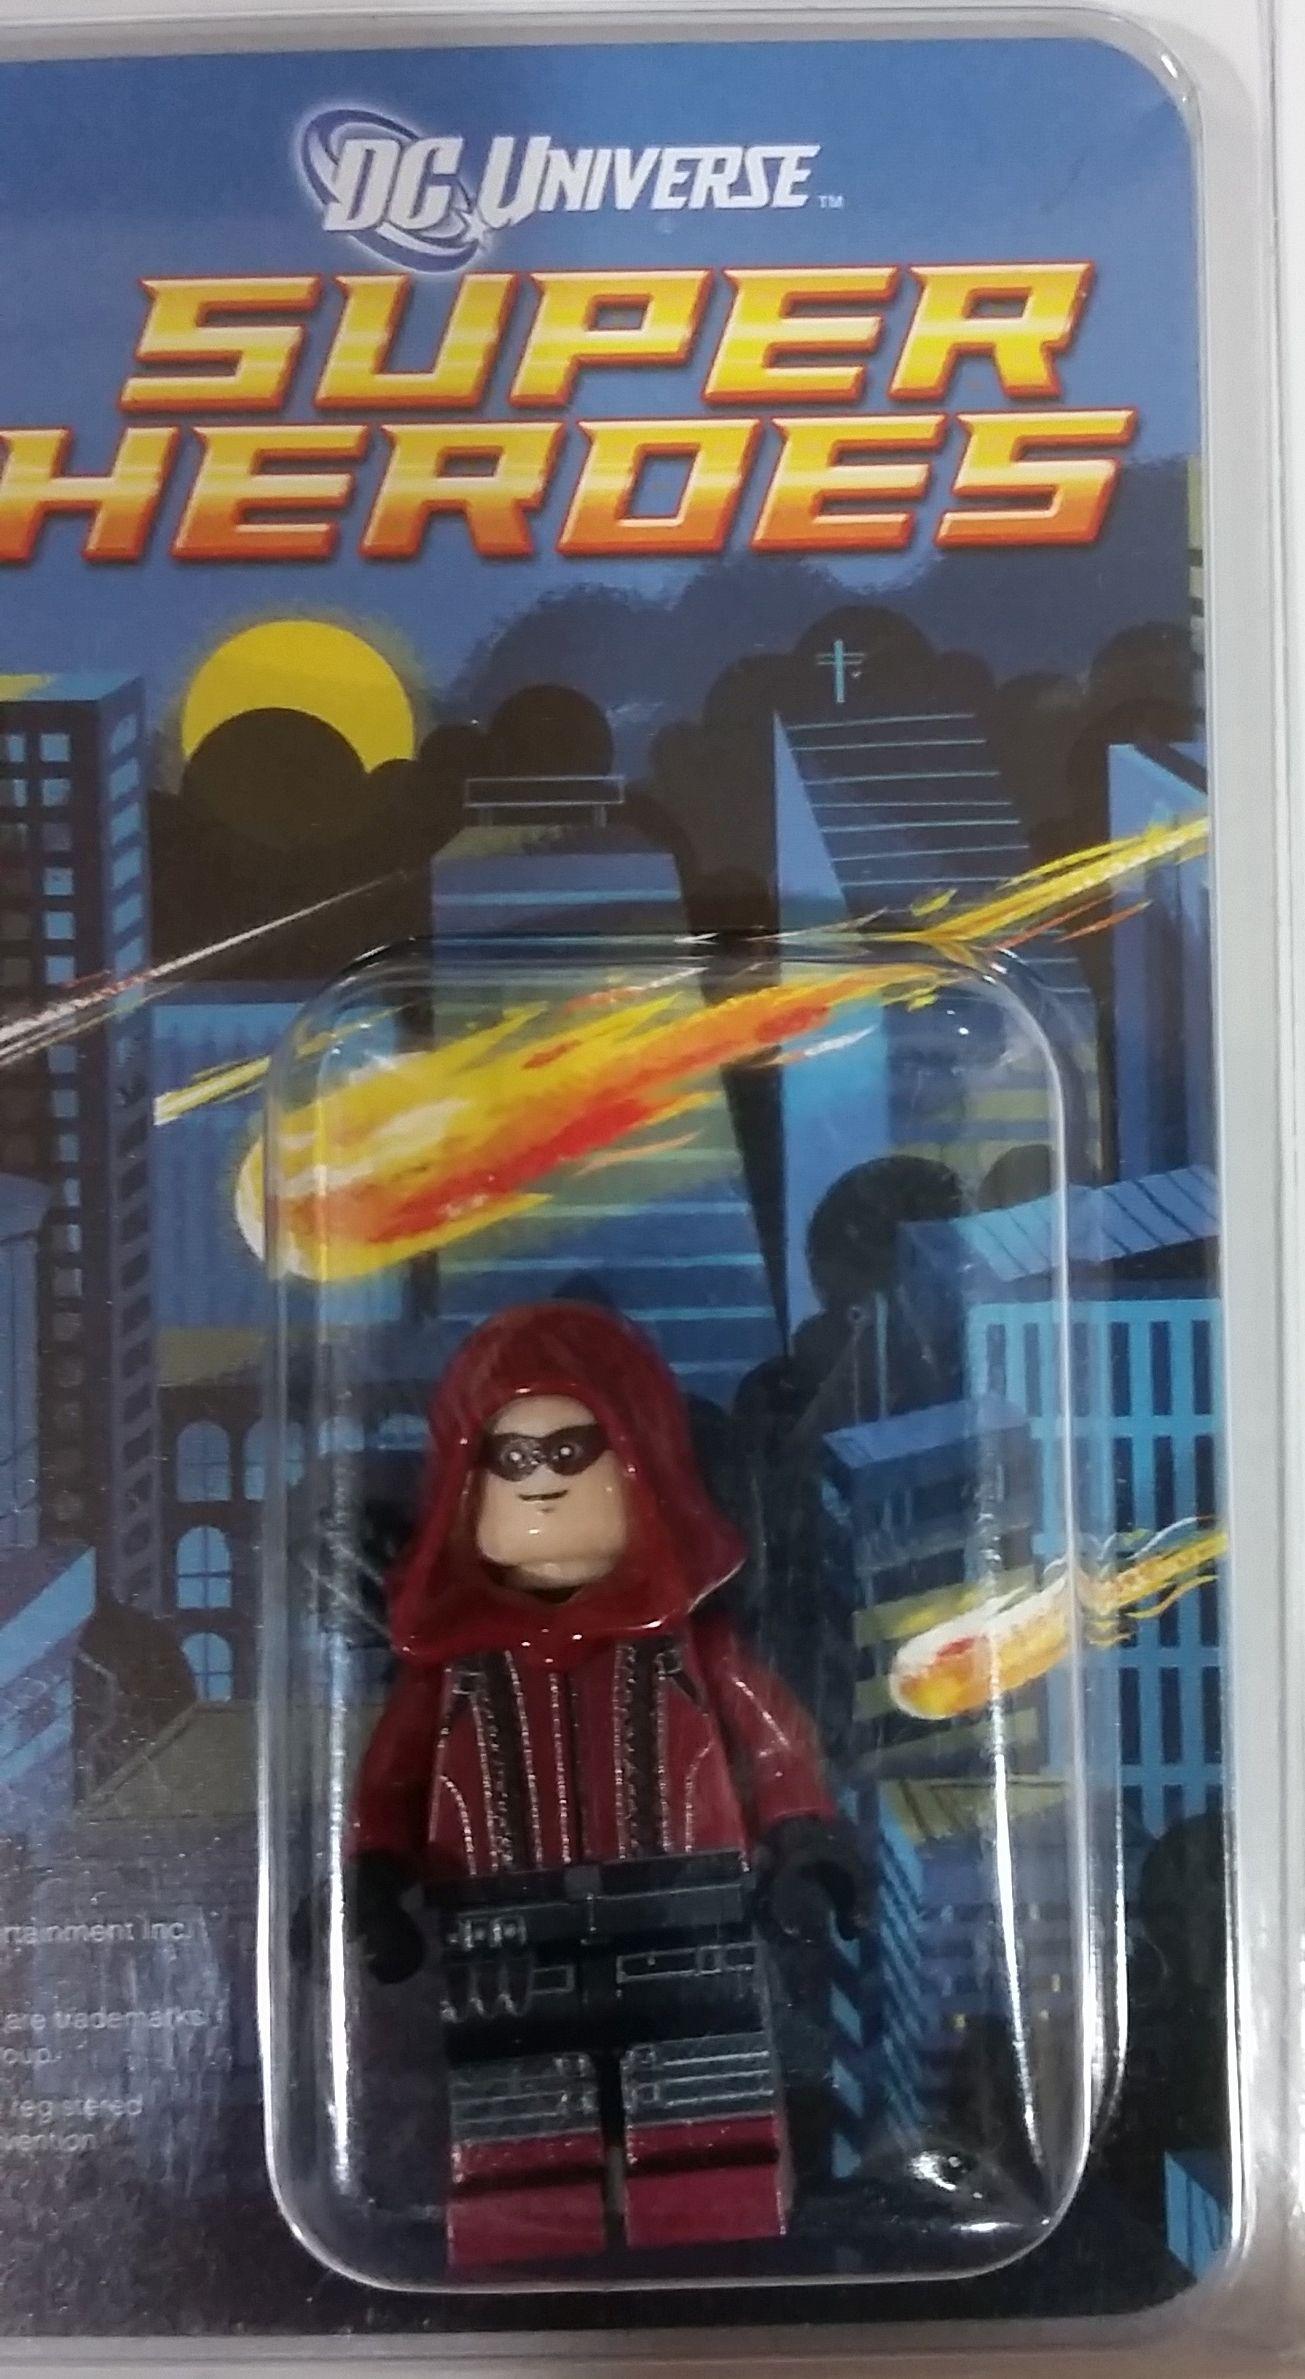 **NEW** LEGO Custom Printed SDCC RED ARROW DC Universe Arsenal Minifigure